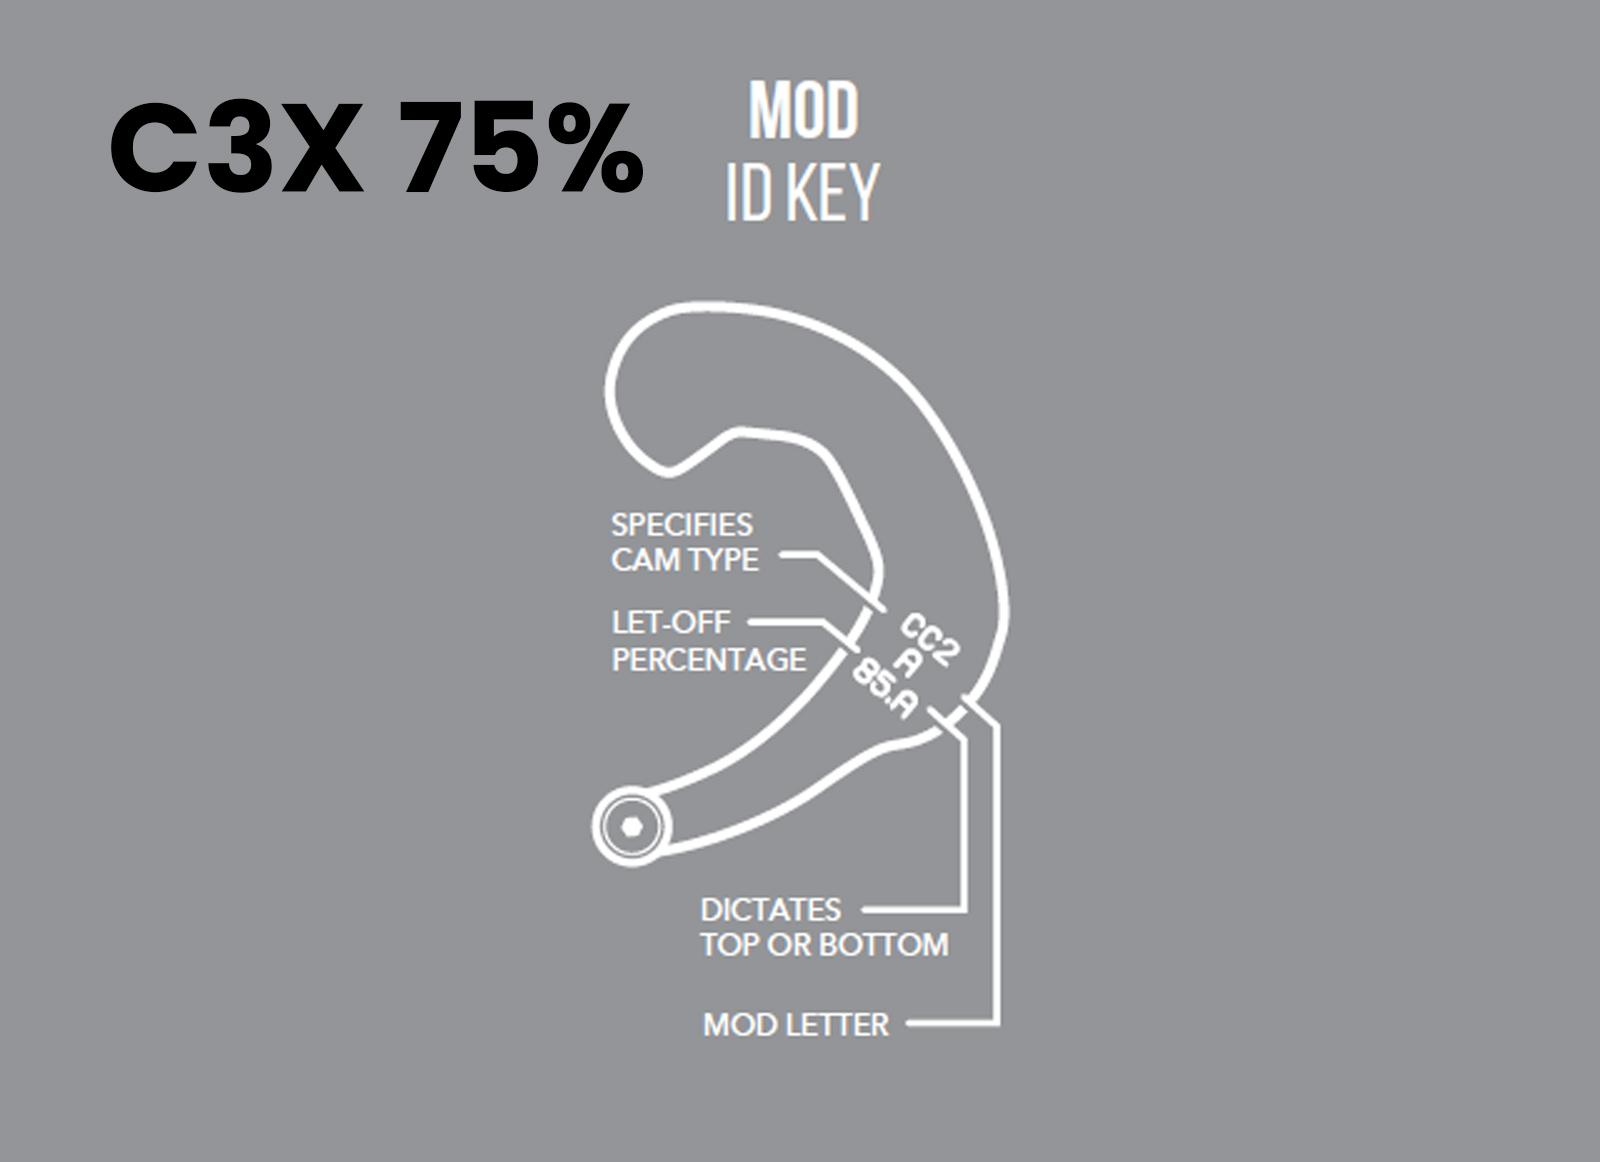 MATHEWS MODULO C3X 75%